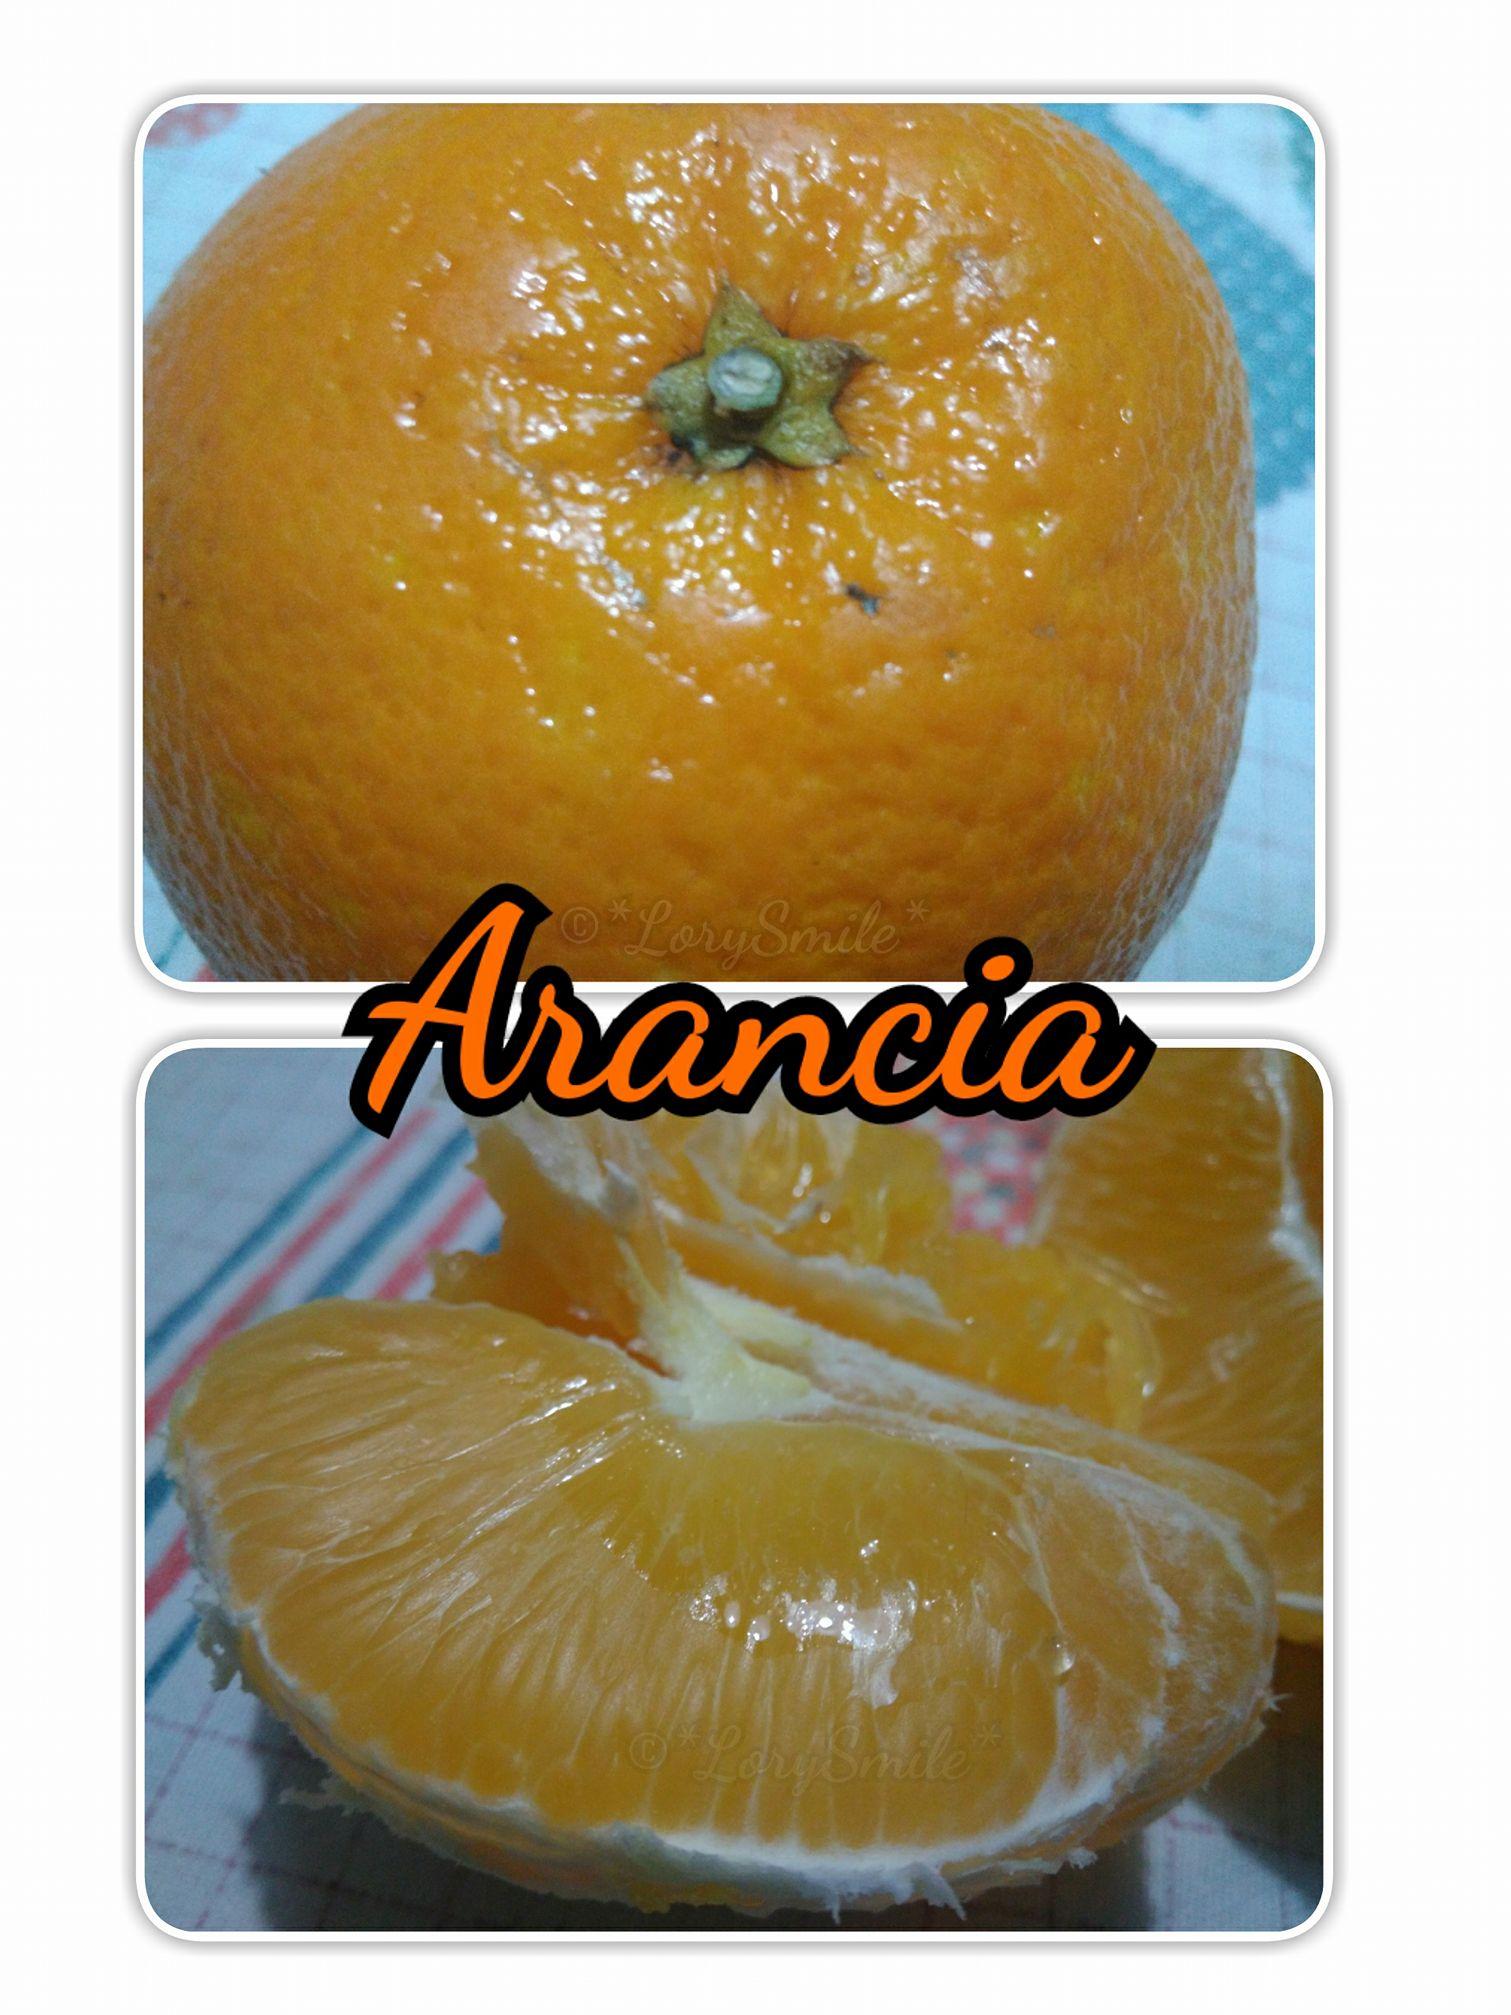 Arancia & Vitamina C !